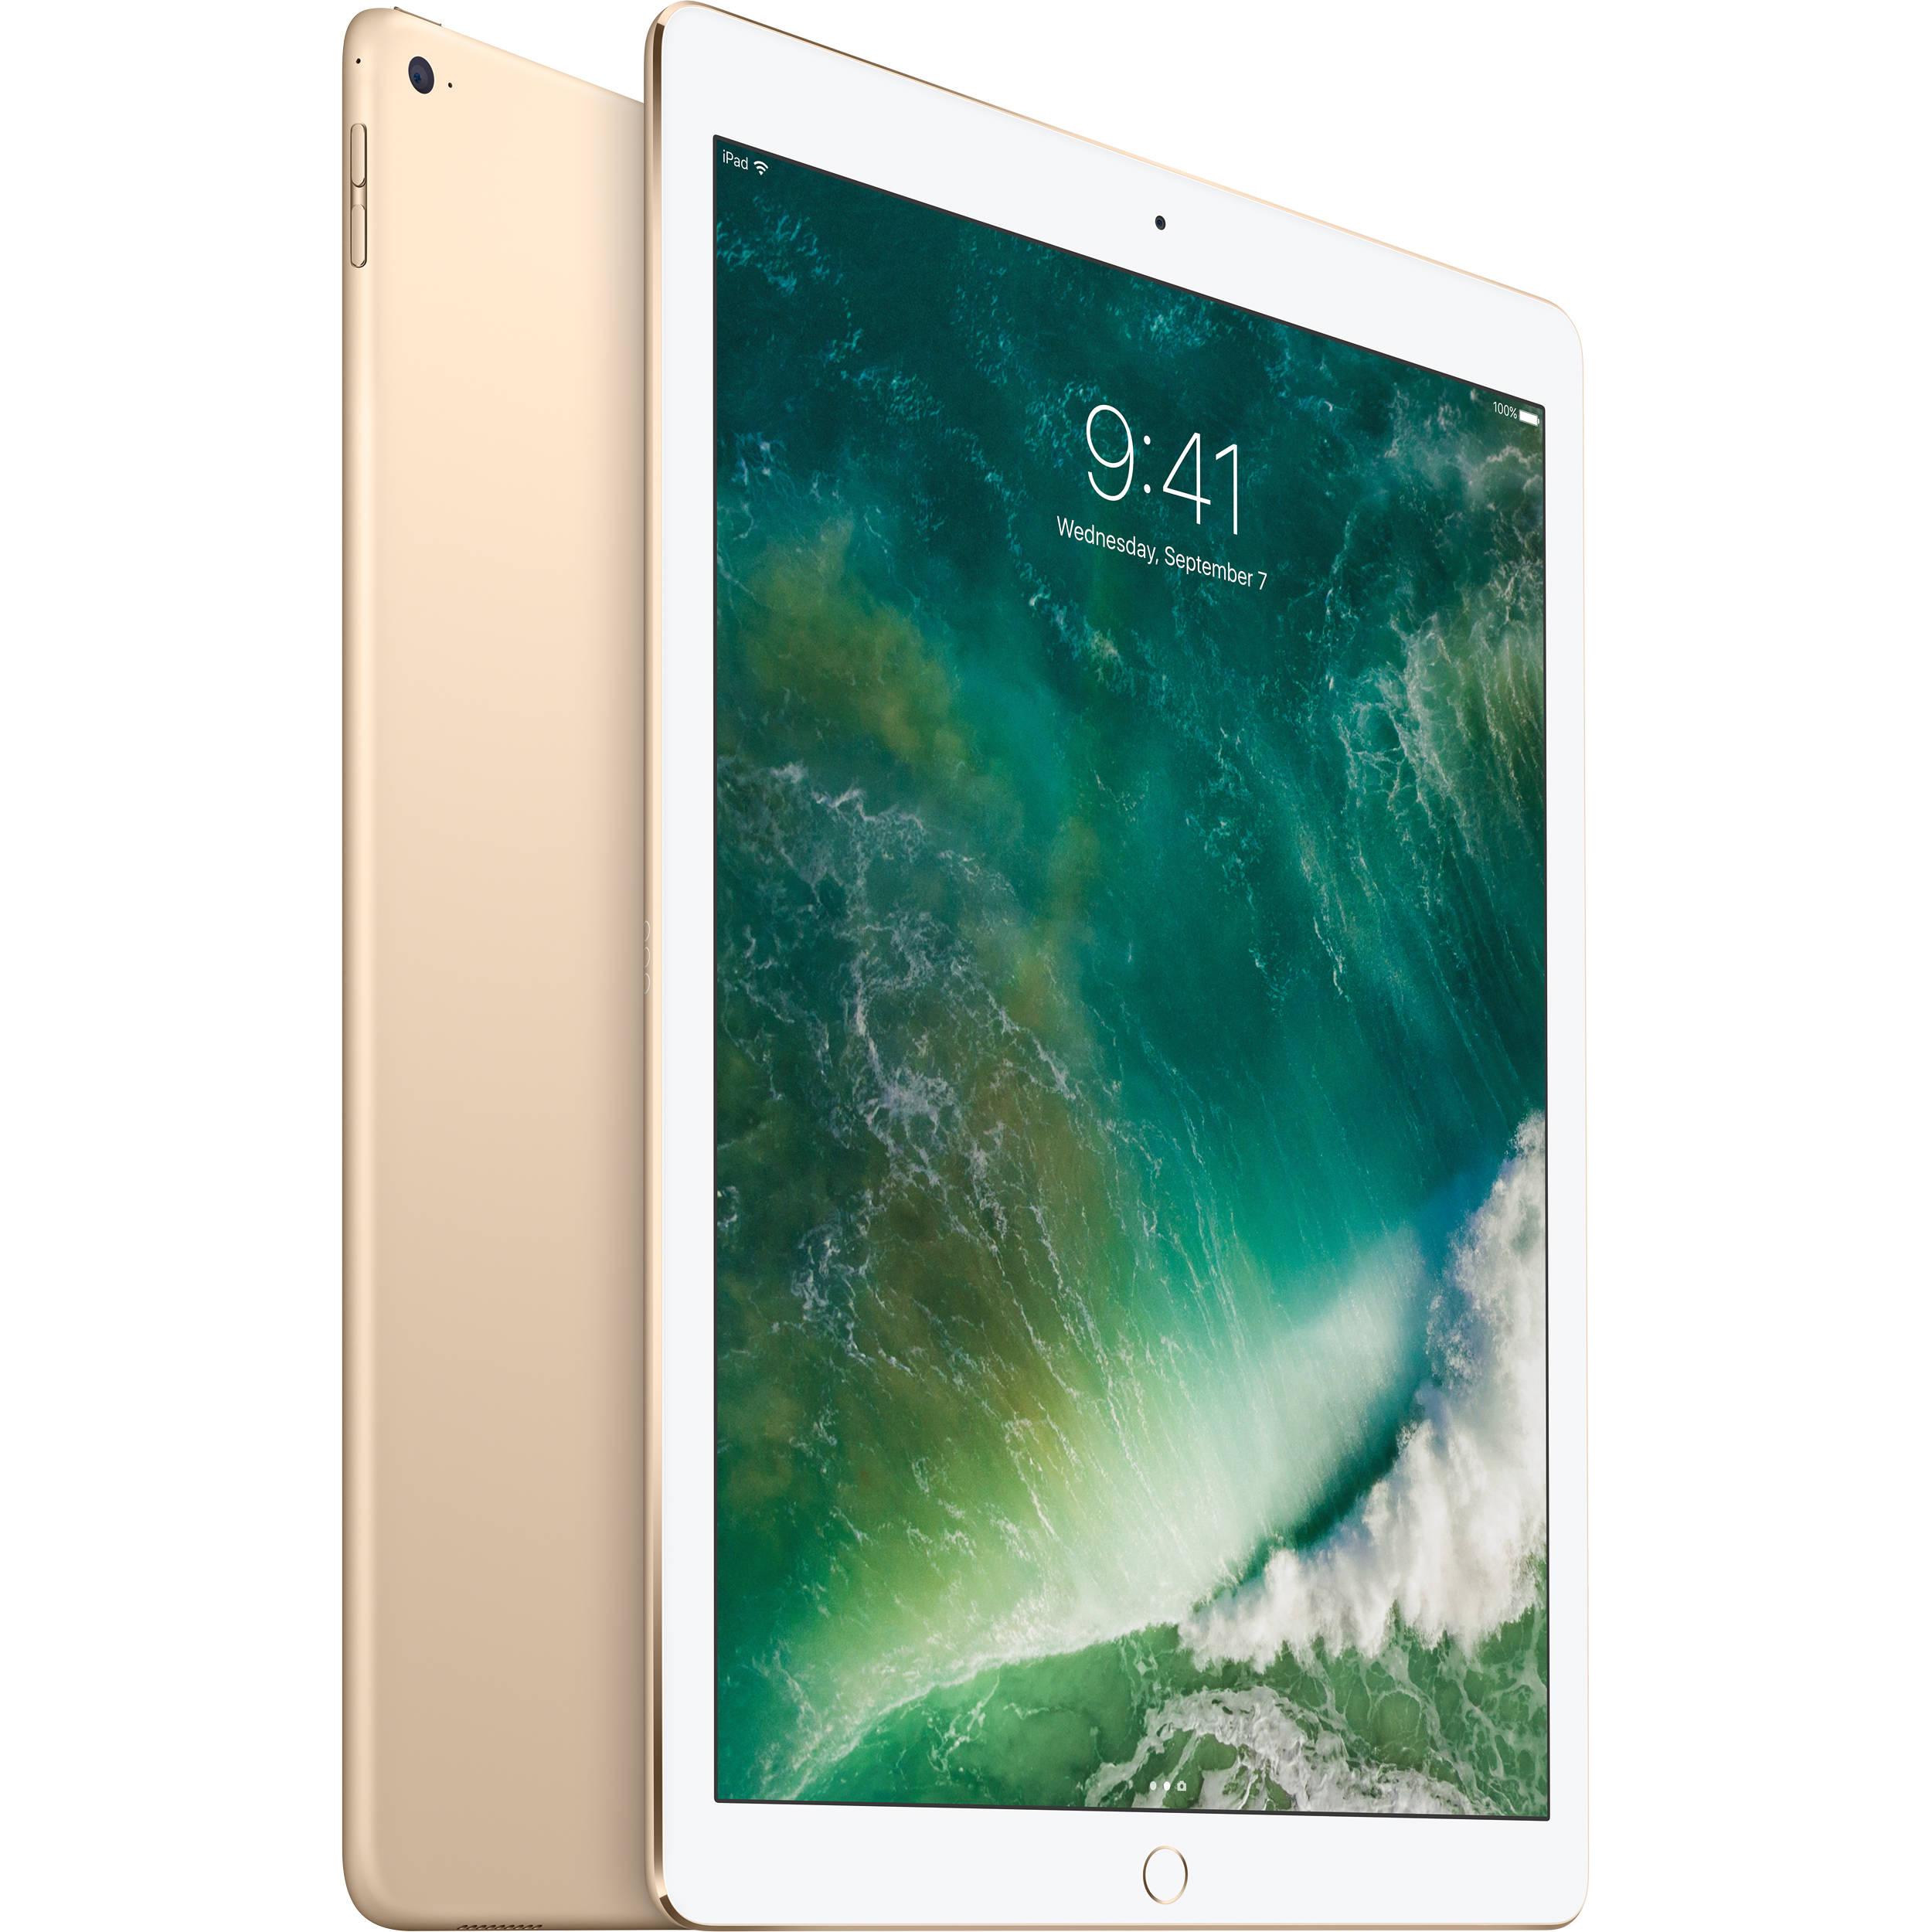 Apple 129 ipad pro 32gb wi fi only gold ml0h2lla bh apple 129 ipad pro 32gb wi fi only ccuart Image collections